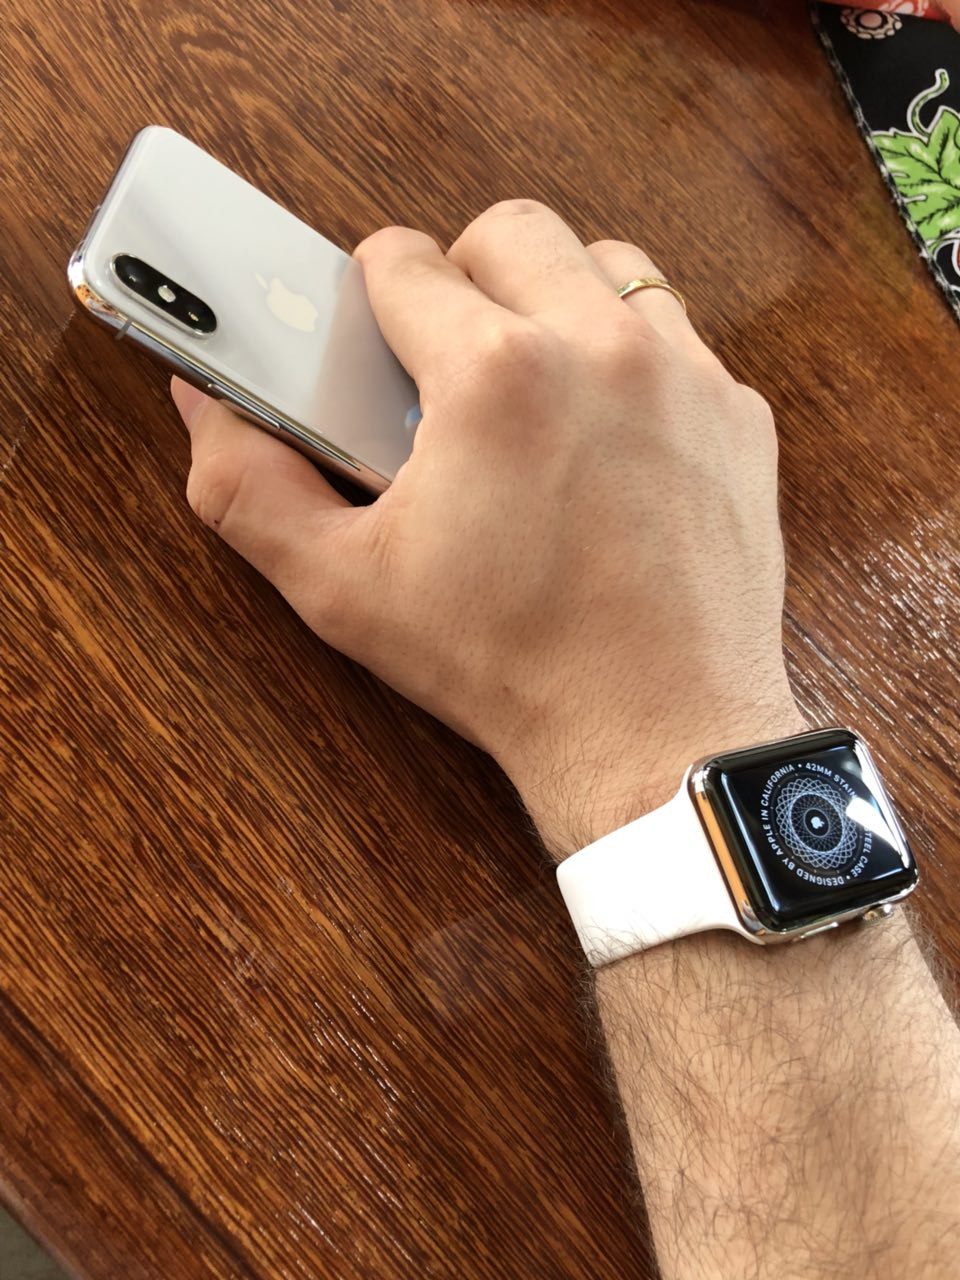 Apple Watch no braço com iPhone X